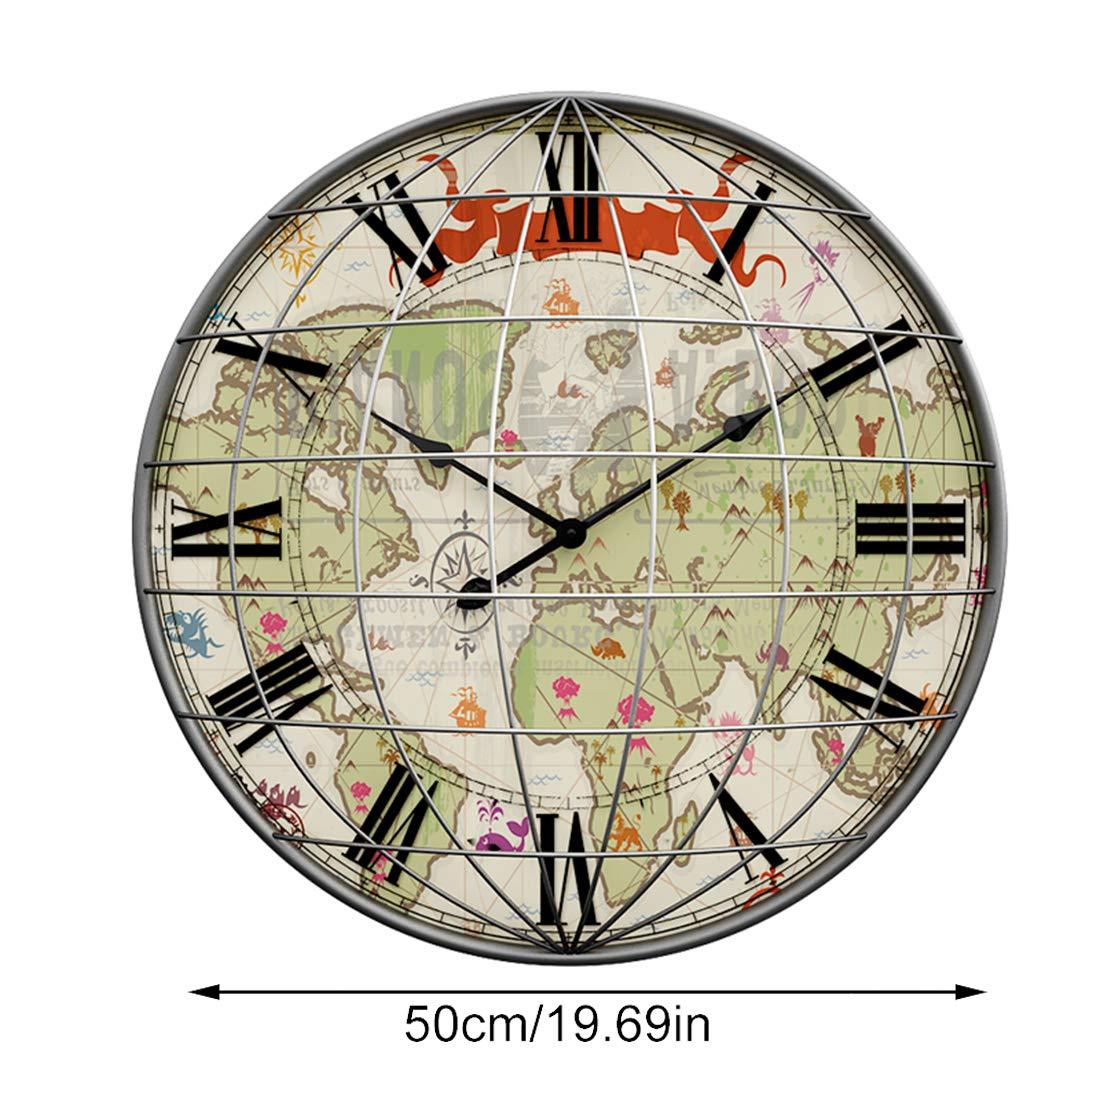 MRKE 50CM 3D Reloj Pared Grande XXXL Vintage Silencioso Metal Retro Mapa Tridimensional Design Reloje de Pared para Cocina/salón/Dormitorio/Baño/Oficina: ...